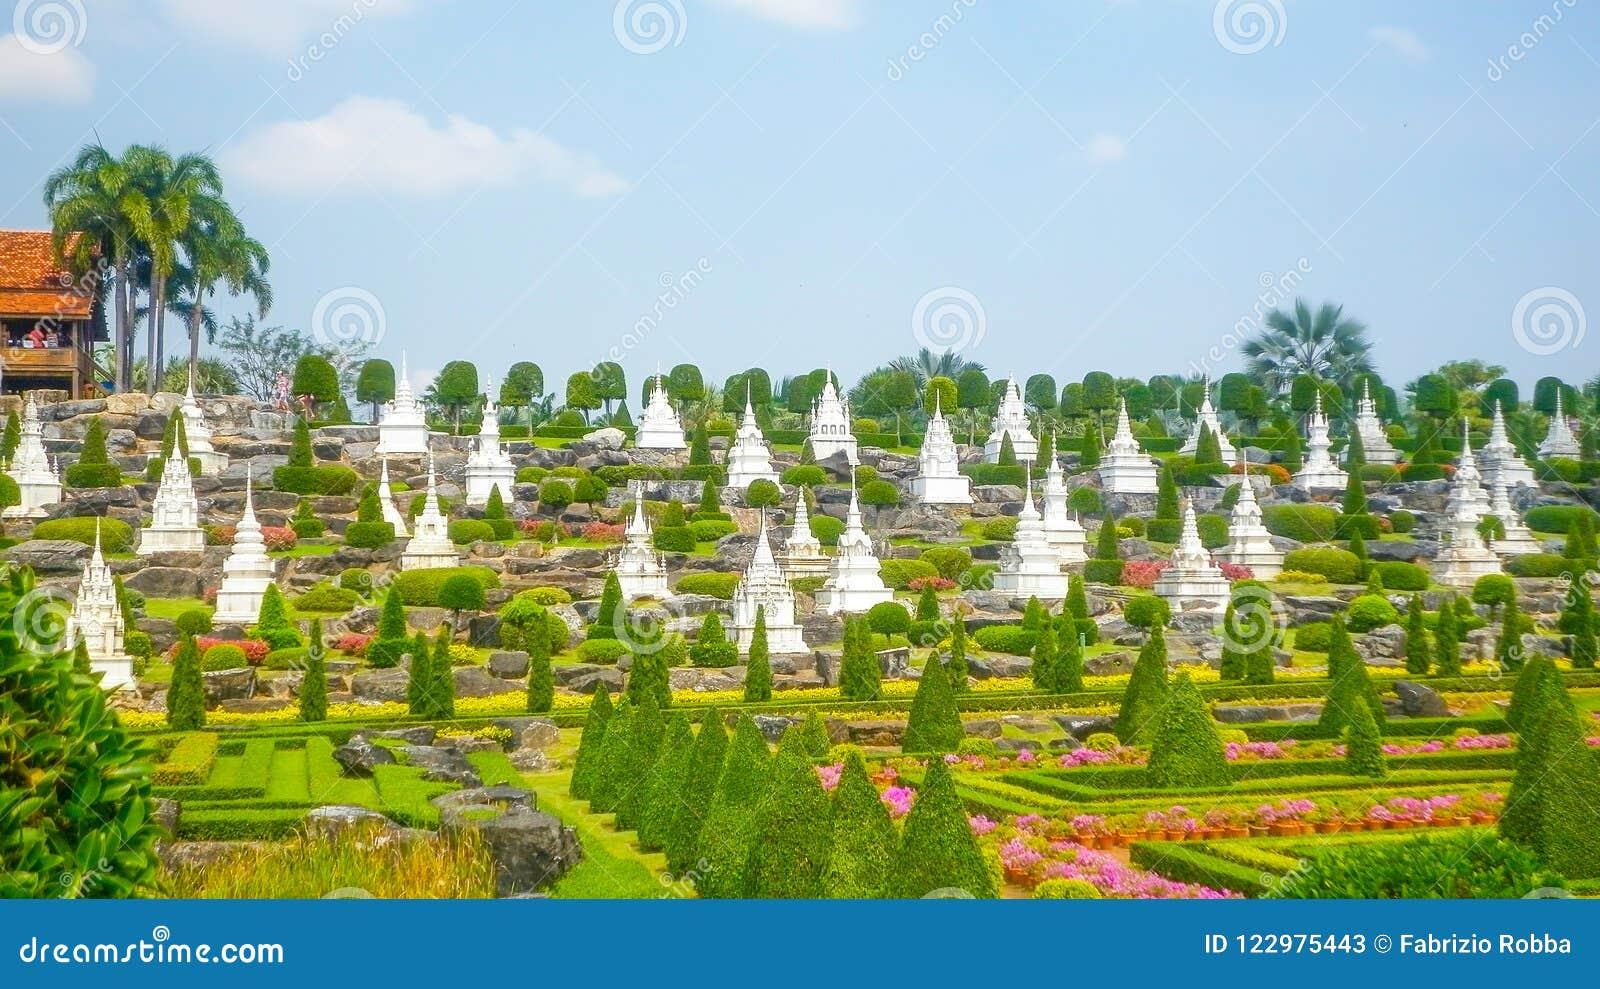 Nong Nooch Garden, Pattaya, Thailand